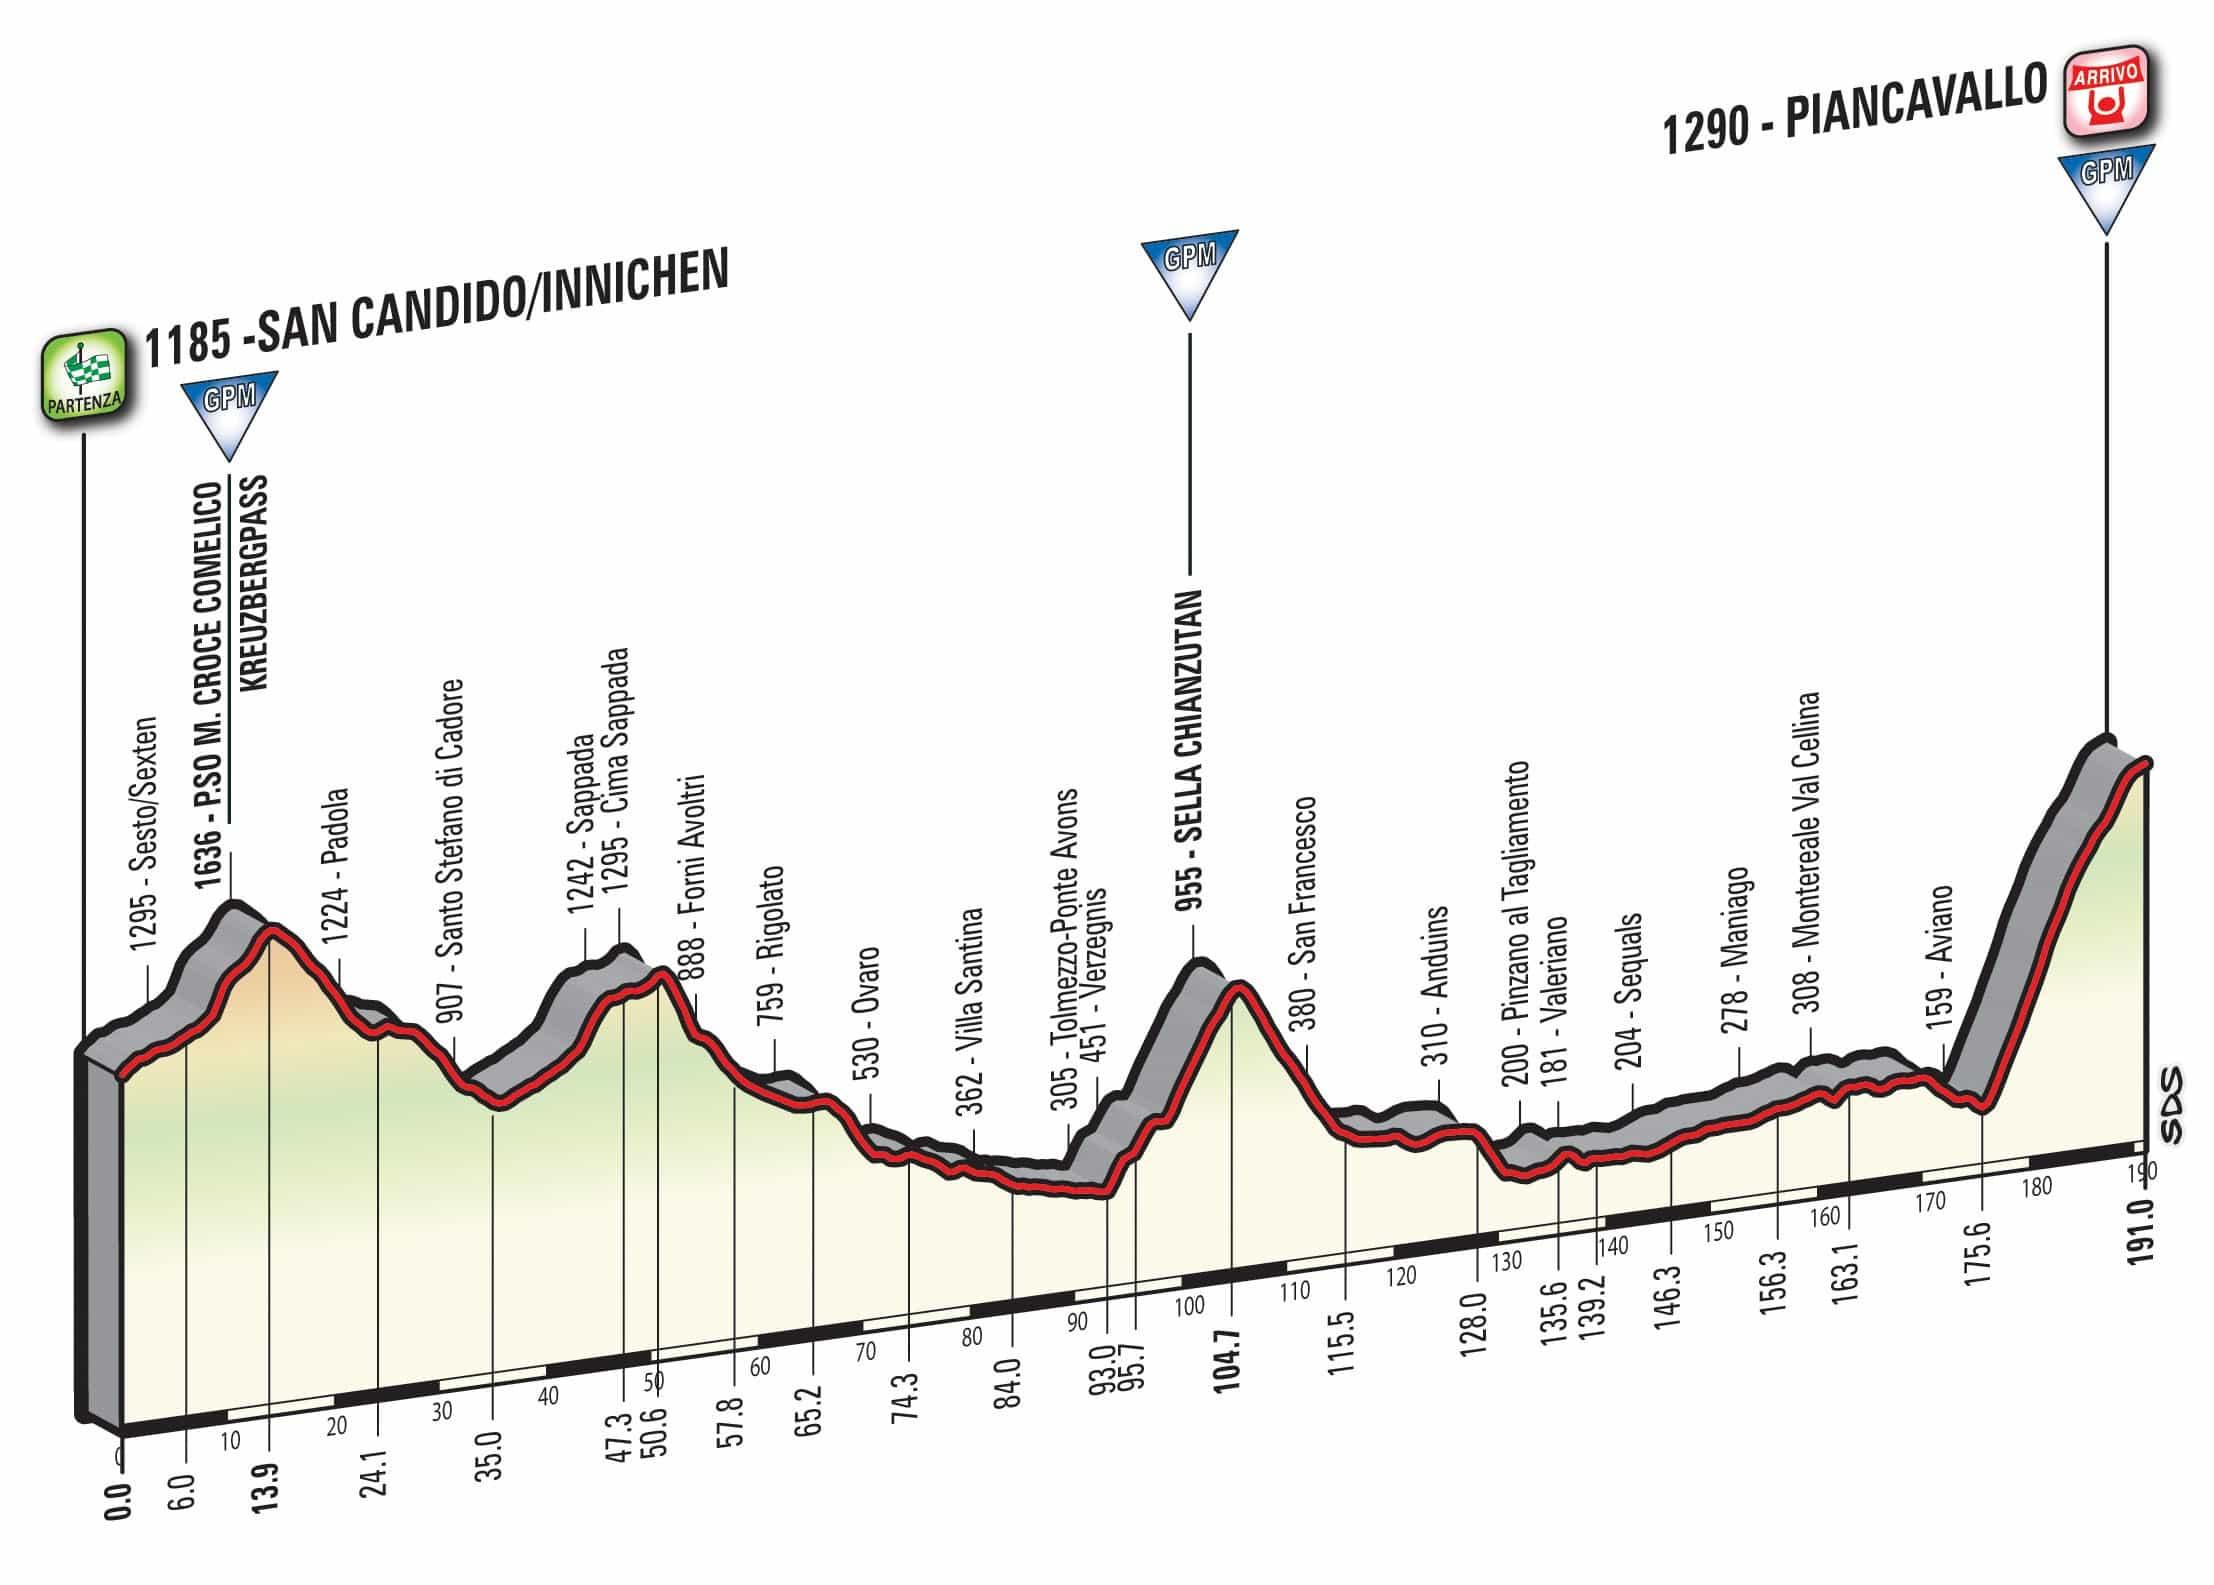 Etapa 19 - Giro de Italia